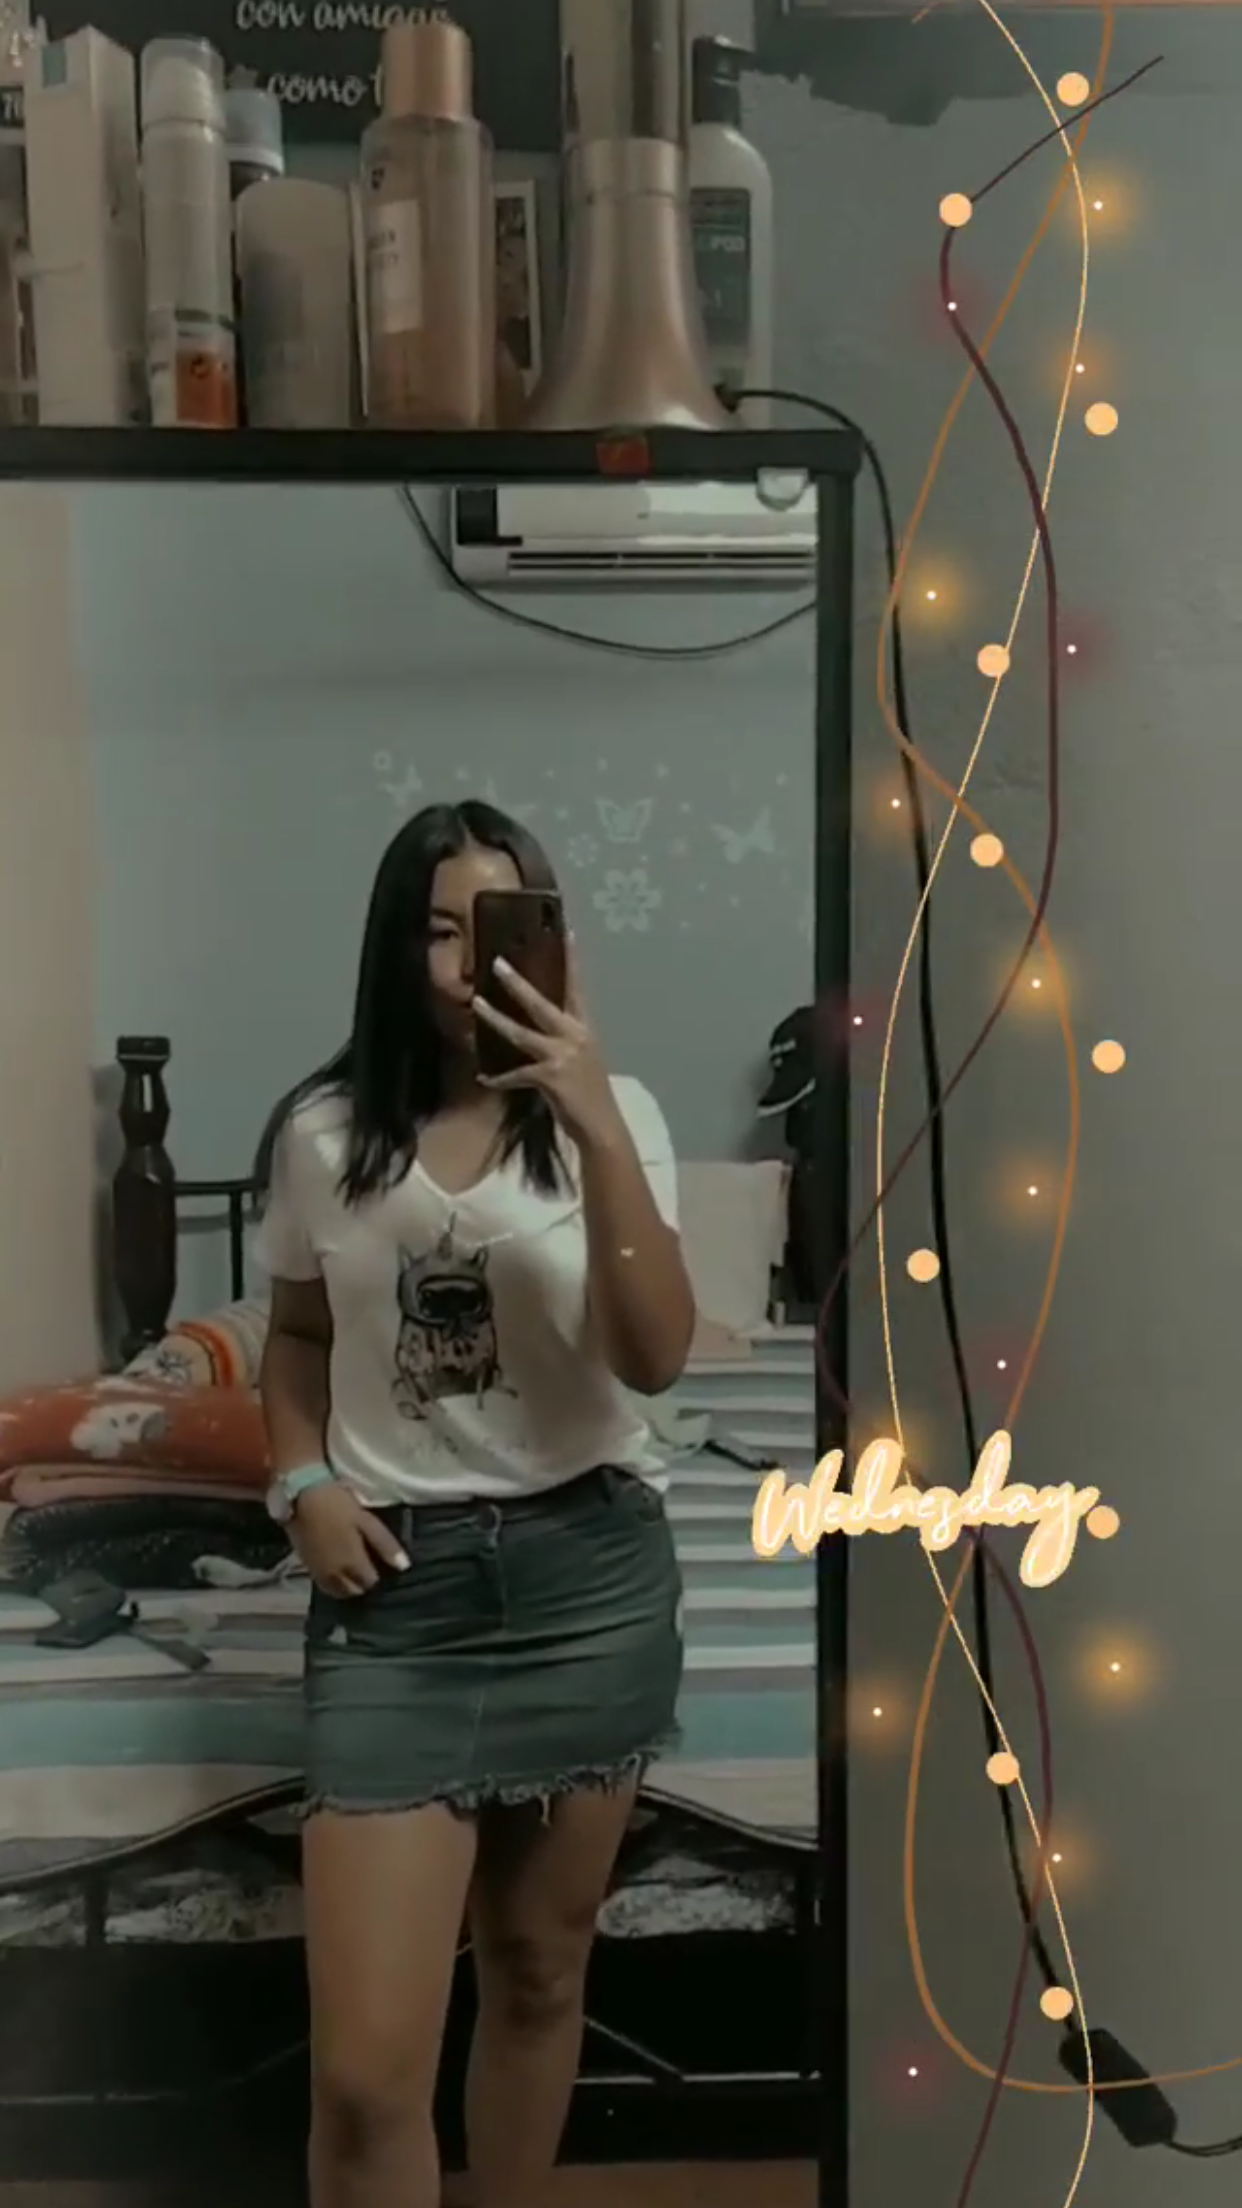 Transgender woman takes selfie in North Carolina bathroom